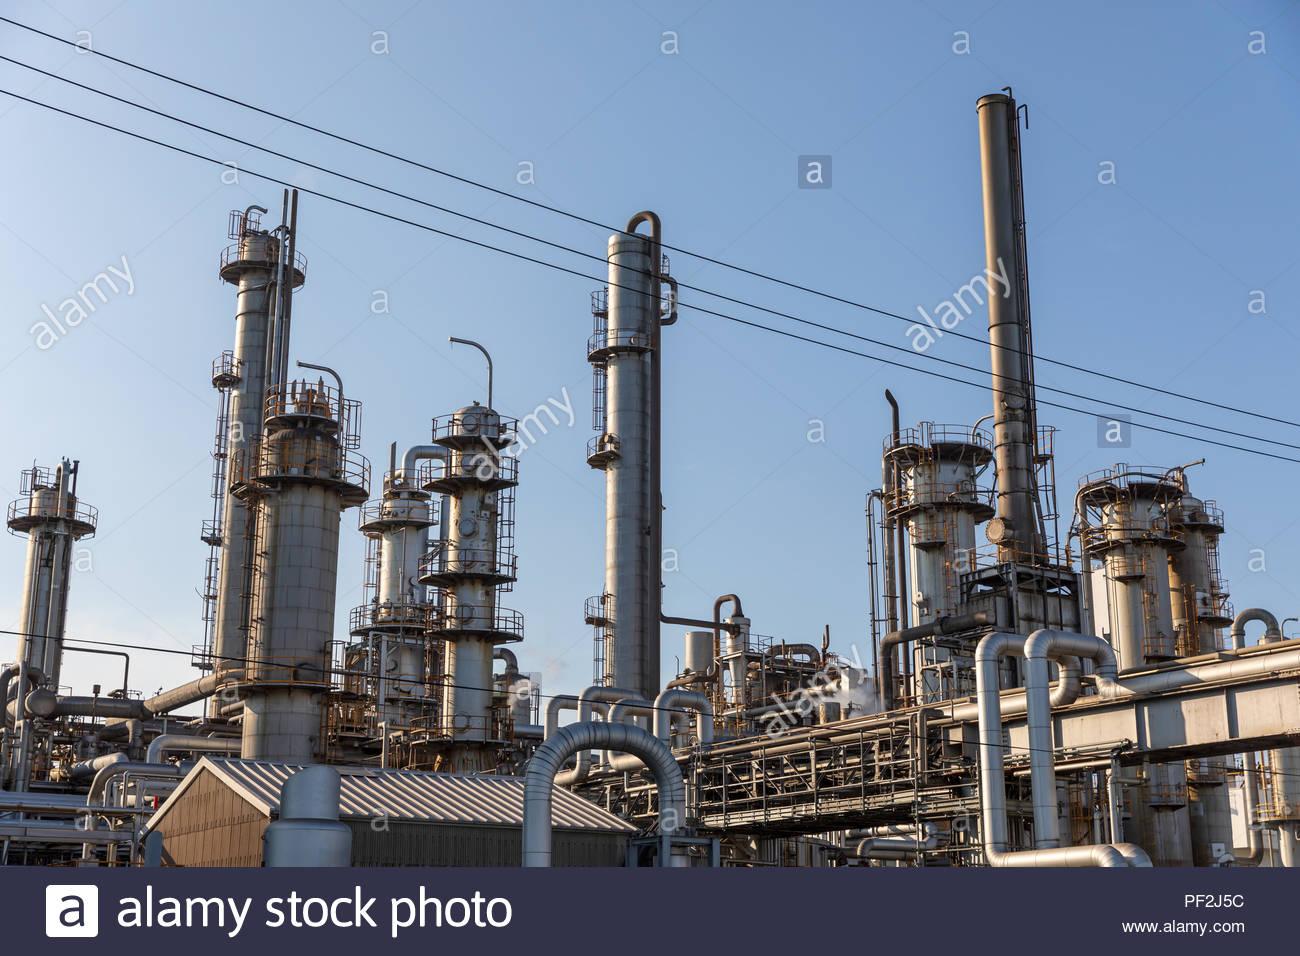 Chemical plant; Kawasaki, Kanagawa Prefecture, Japan - Stock Image